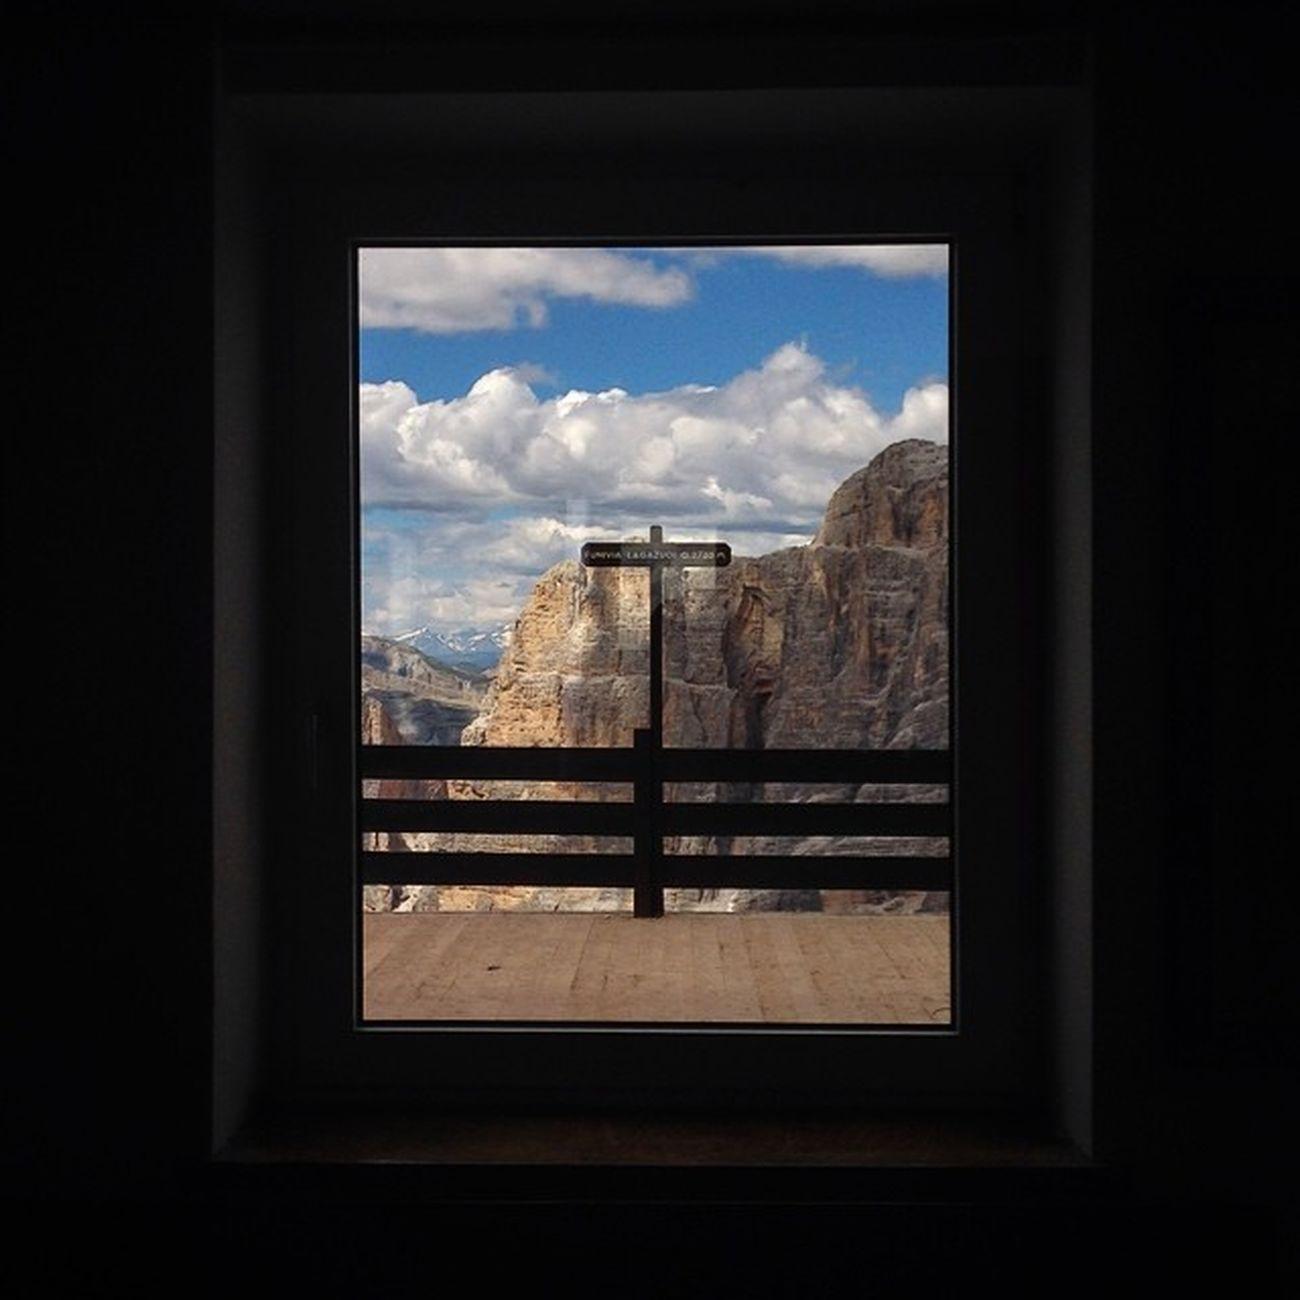 Mountains Framed Fineart Iphonography Alps Instalife Dolomites Summer2014 LifeLessOrdinary Meshpics Lagazuoi Webstapics